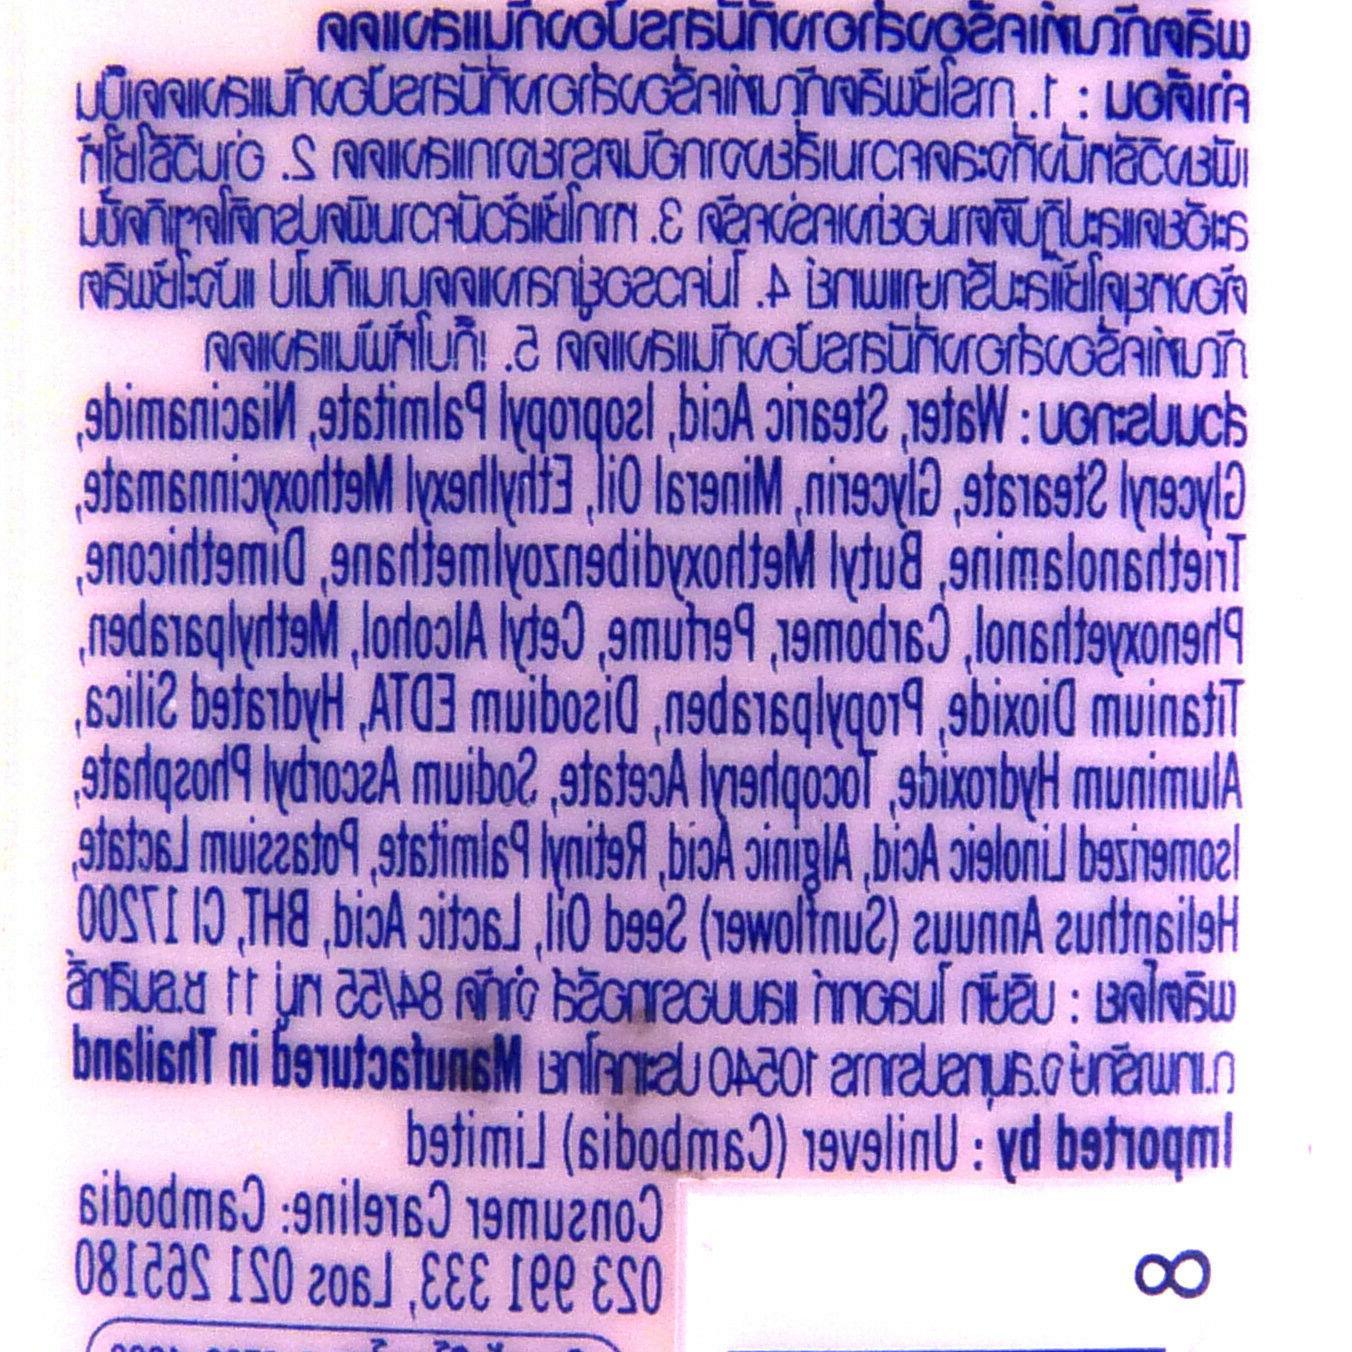 Vaseline Healthy Perfect Skin Whitening AHA Body Lotion